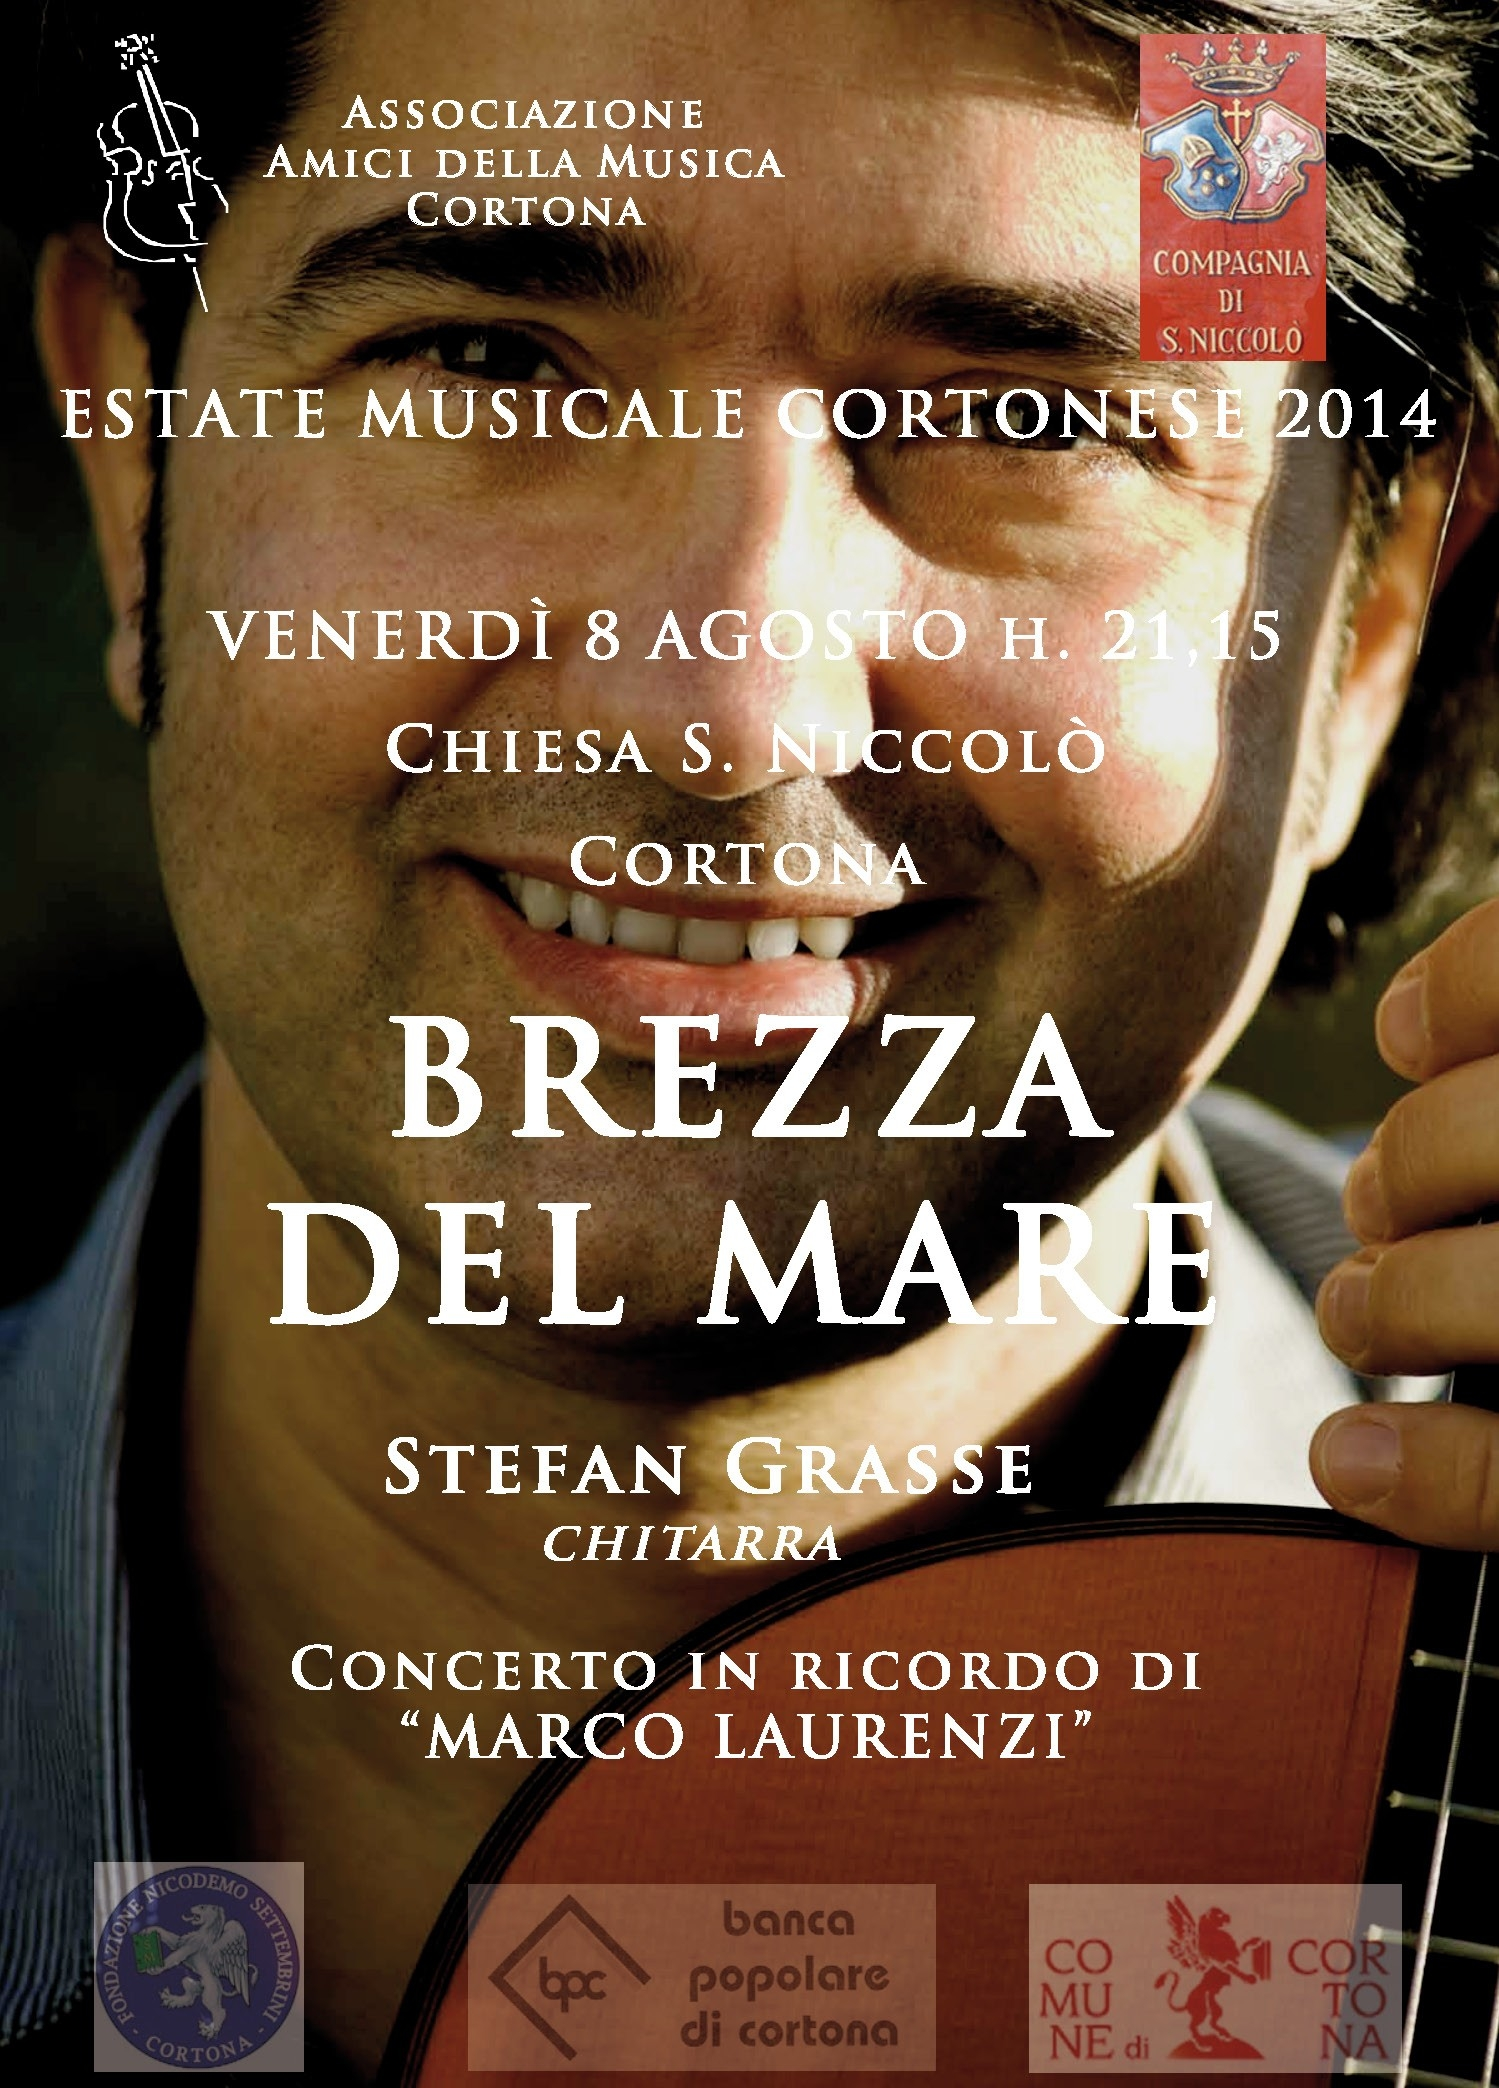 Estate Musicale Cortonese: appuntamento a San Niccolò col chitarrista Stefan Grasse